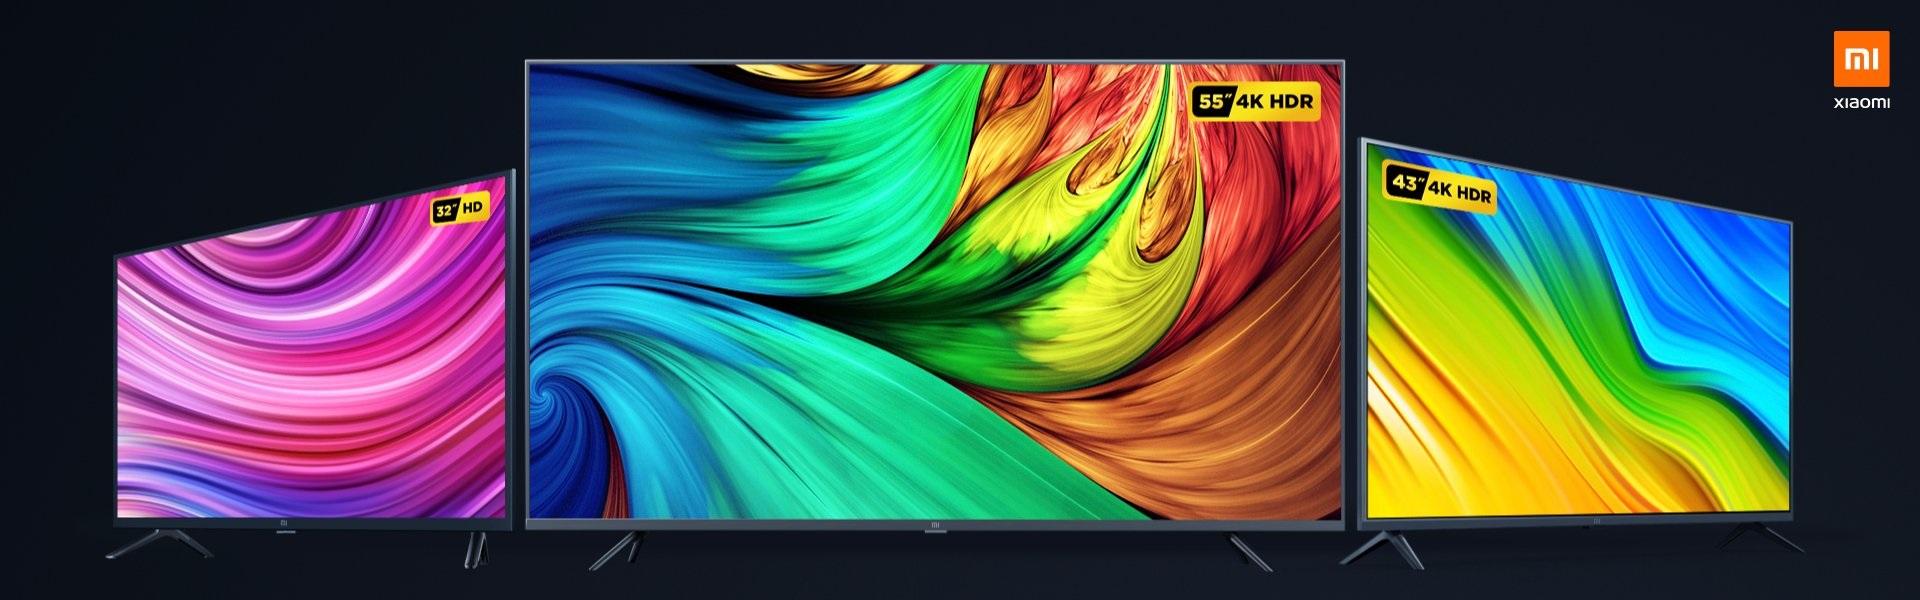 "telewizor Xiaomi Mi TV 4A 32"", Xiaomi Mi TV 4S 55"" i Xiaomi Mi TV 43"""